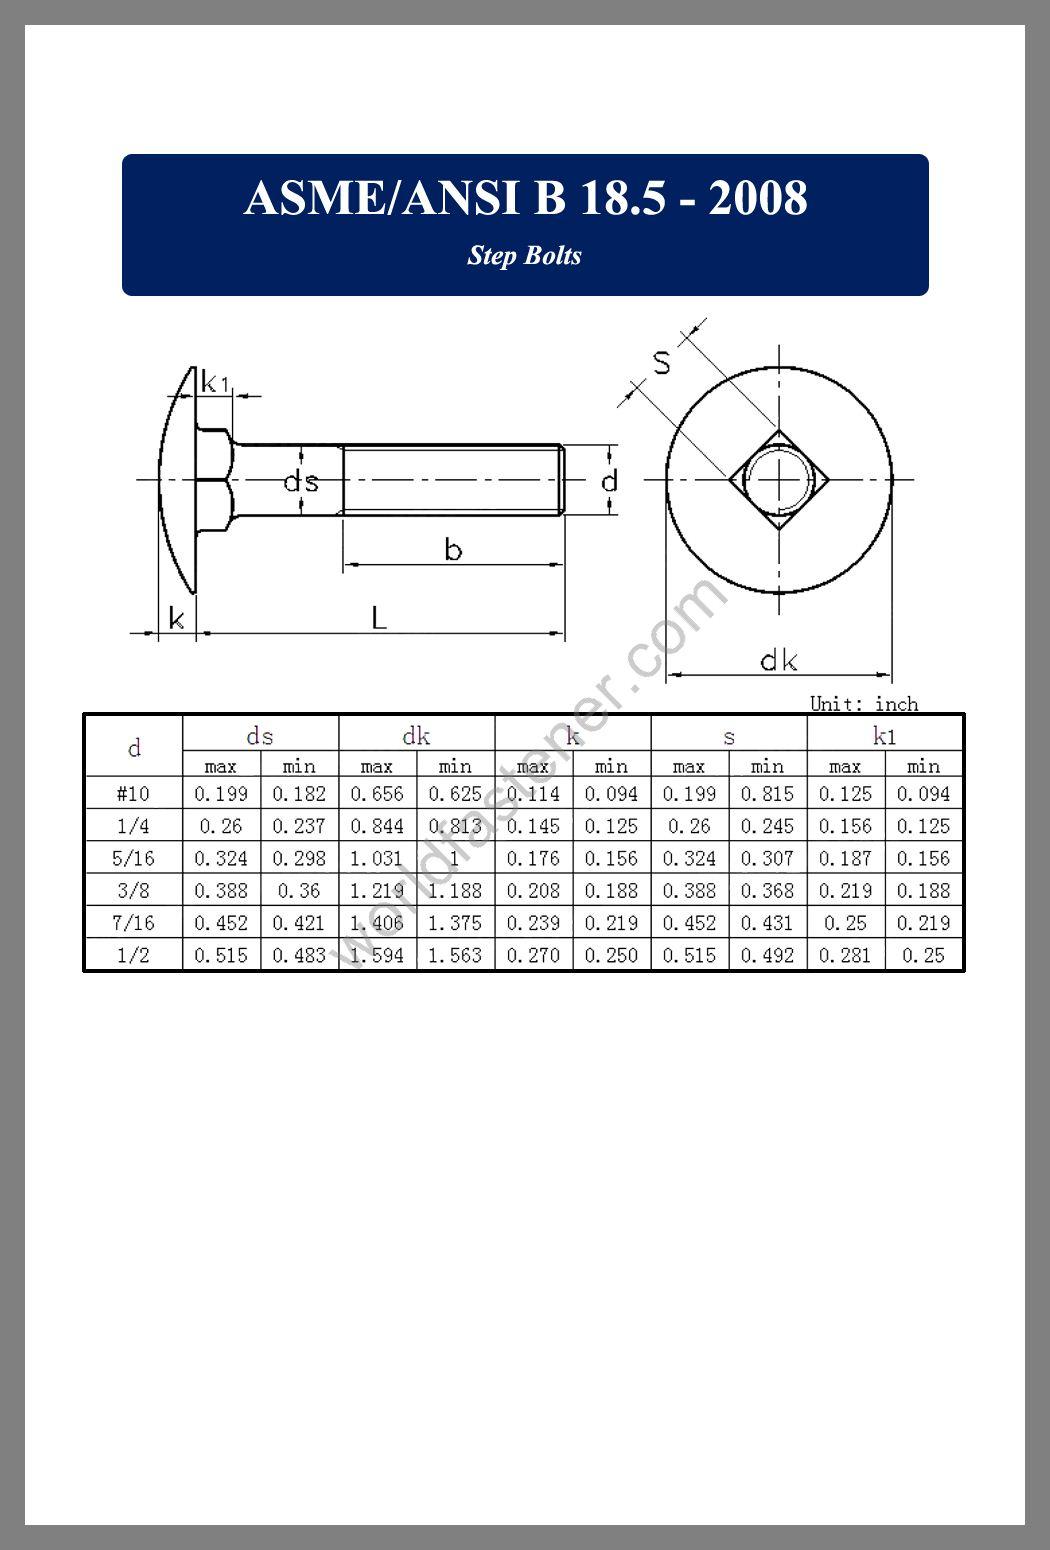 ASME-ANSI B18.5, ASME-ANSI B18.5 Round Head Bolts, fastener, screw, bolt